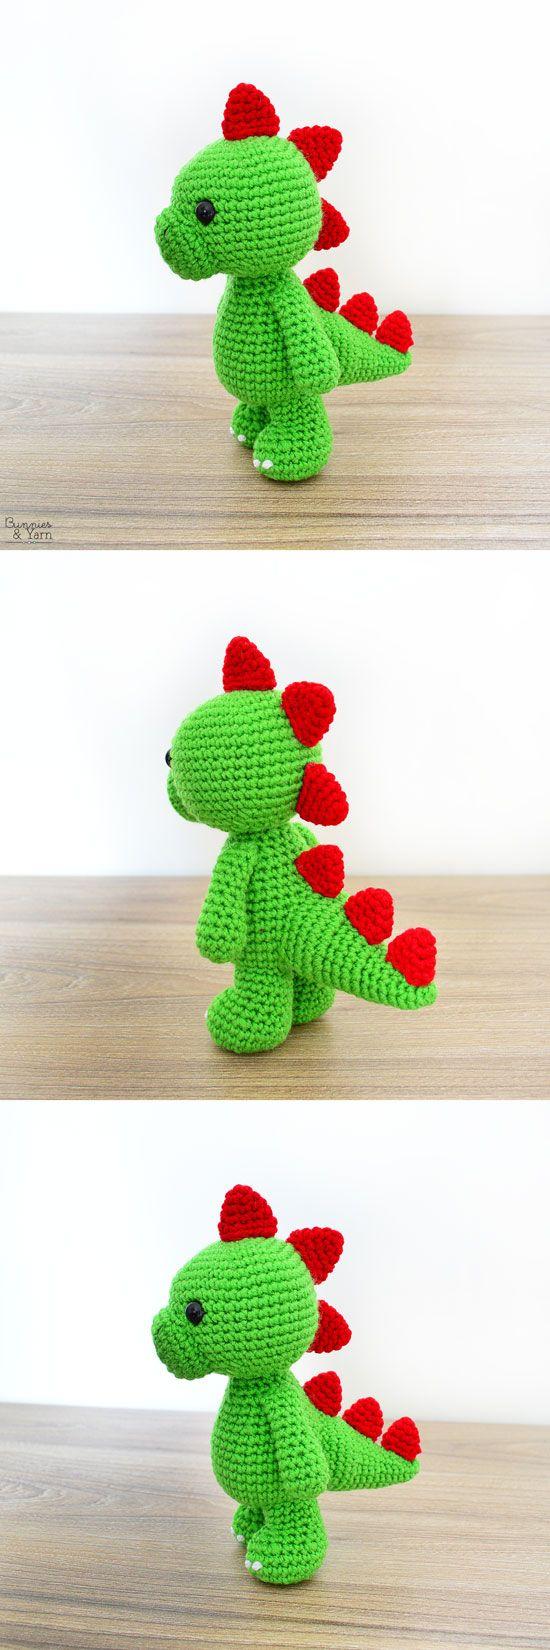 CROCHET PATTERN in English - Tim the Lovely Dinosaur - 9/23 cm. tall - Animal Amigurumi Toy - Instant PDF Download #crochetdinosaurpatterns